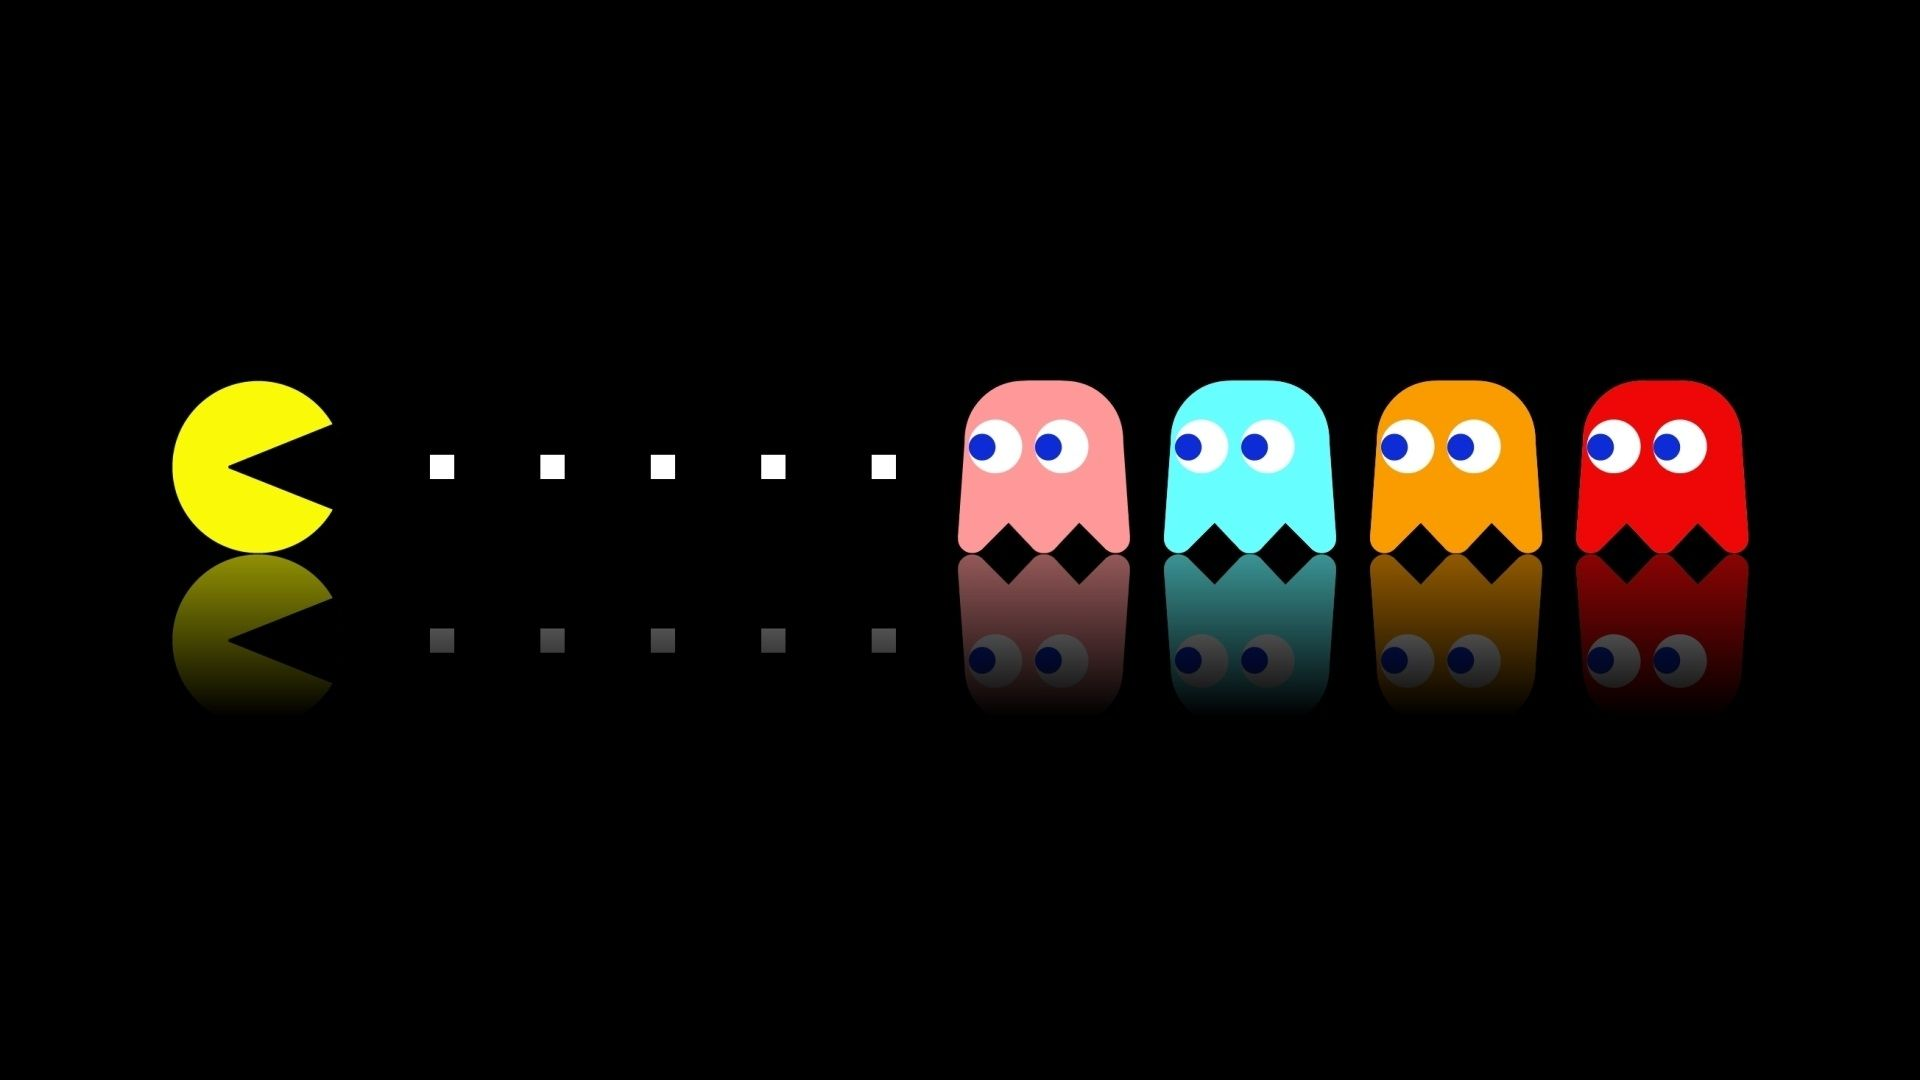 Pacman Wallpaper 1920x1080 In 2019 Gaming Wallpapers